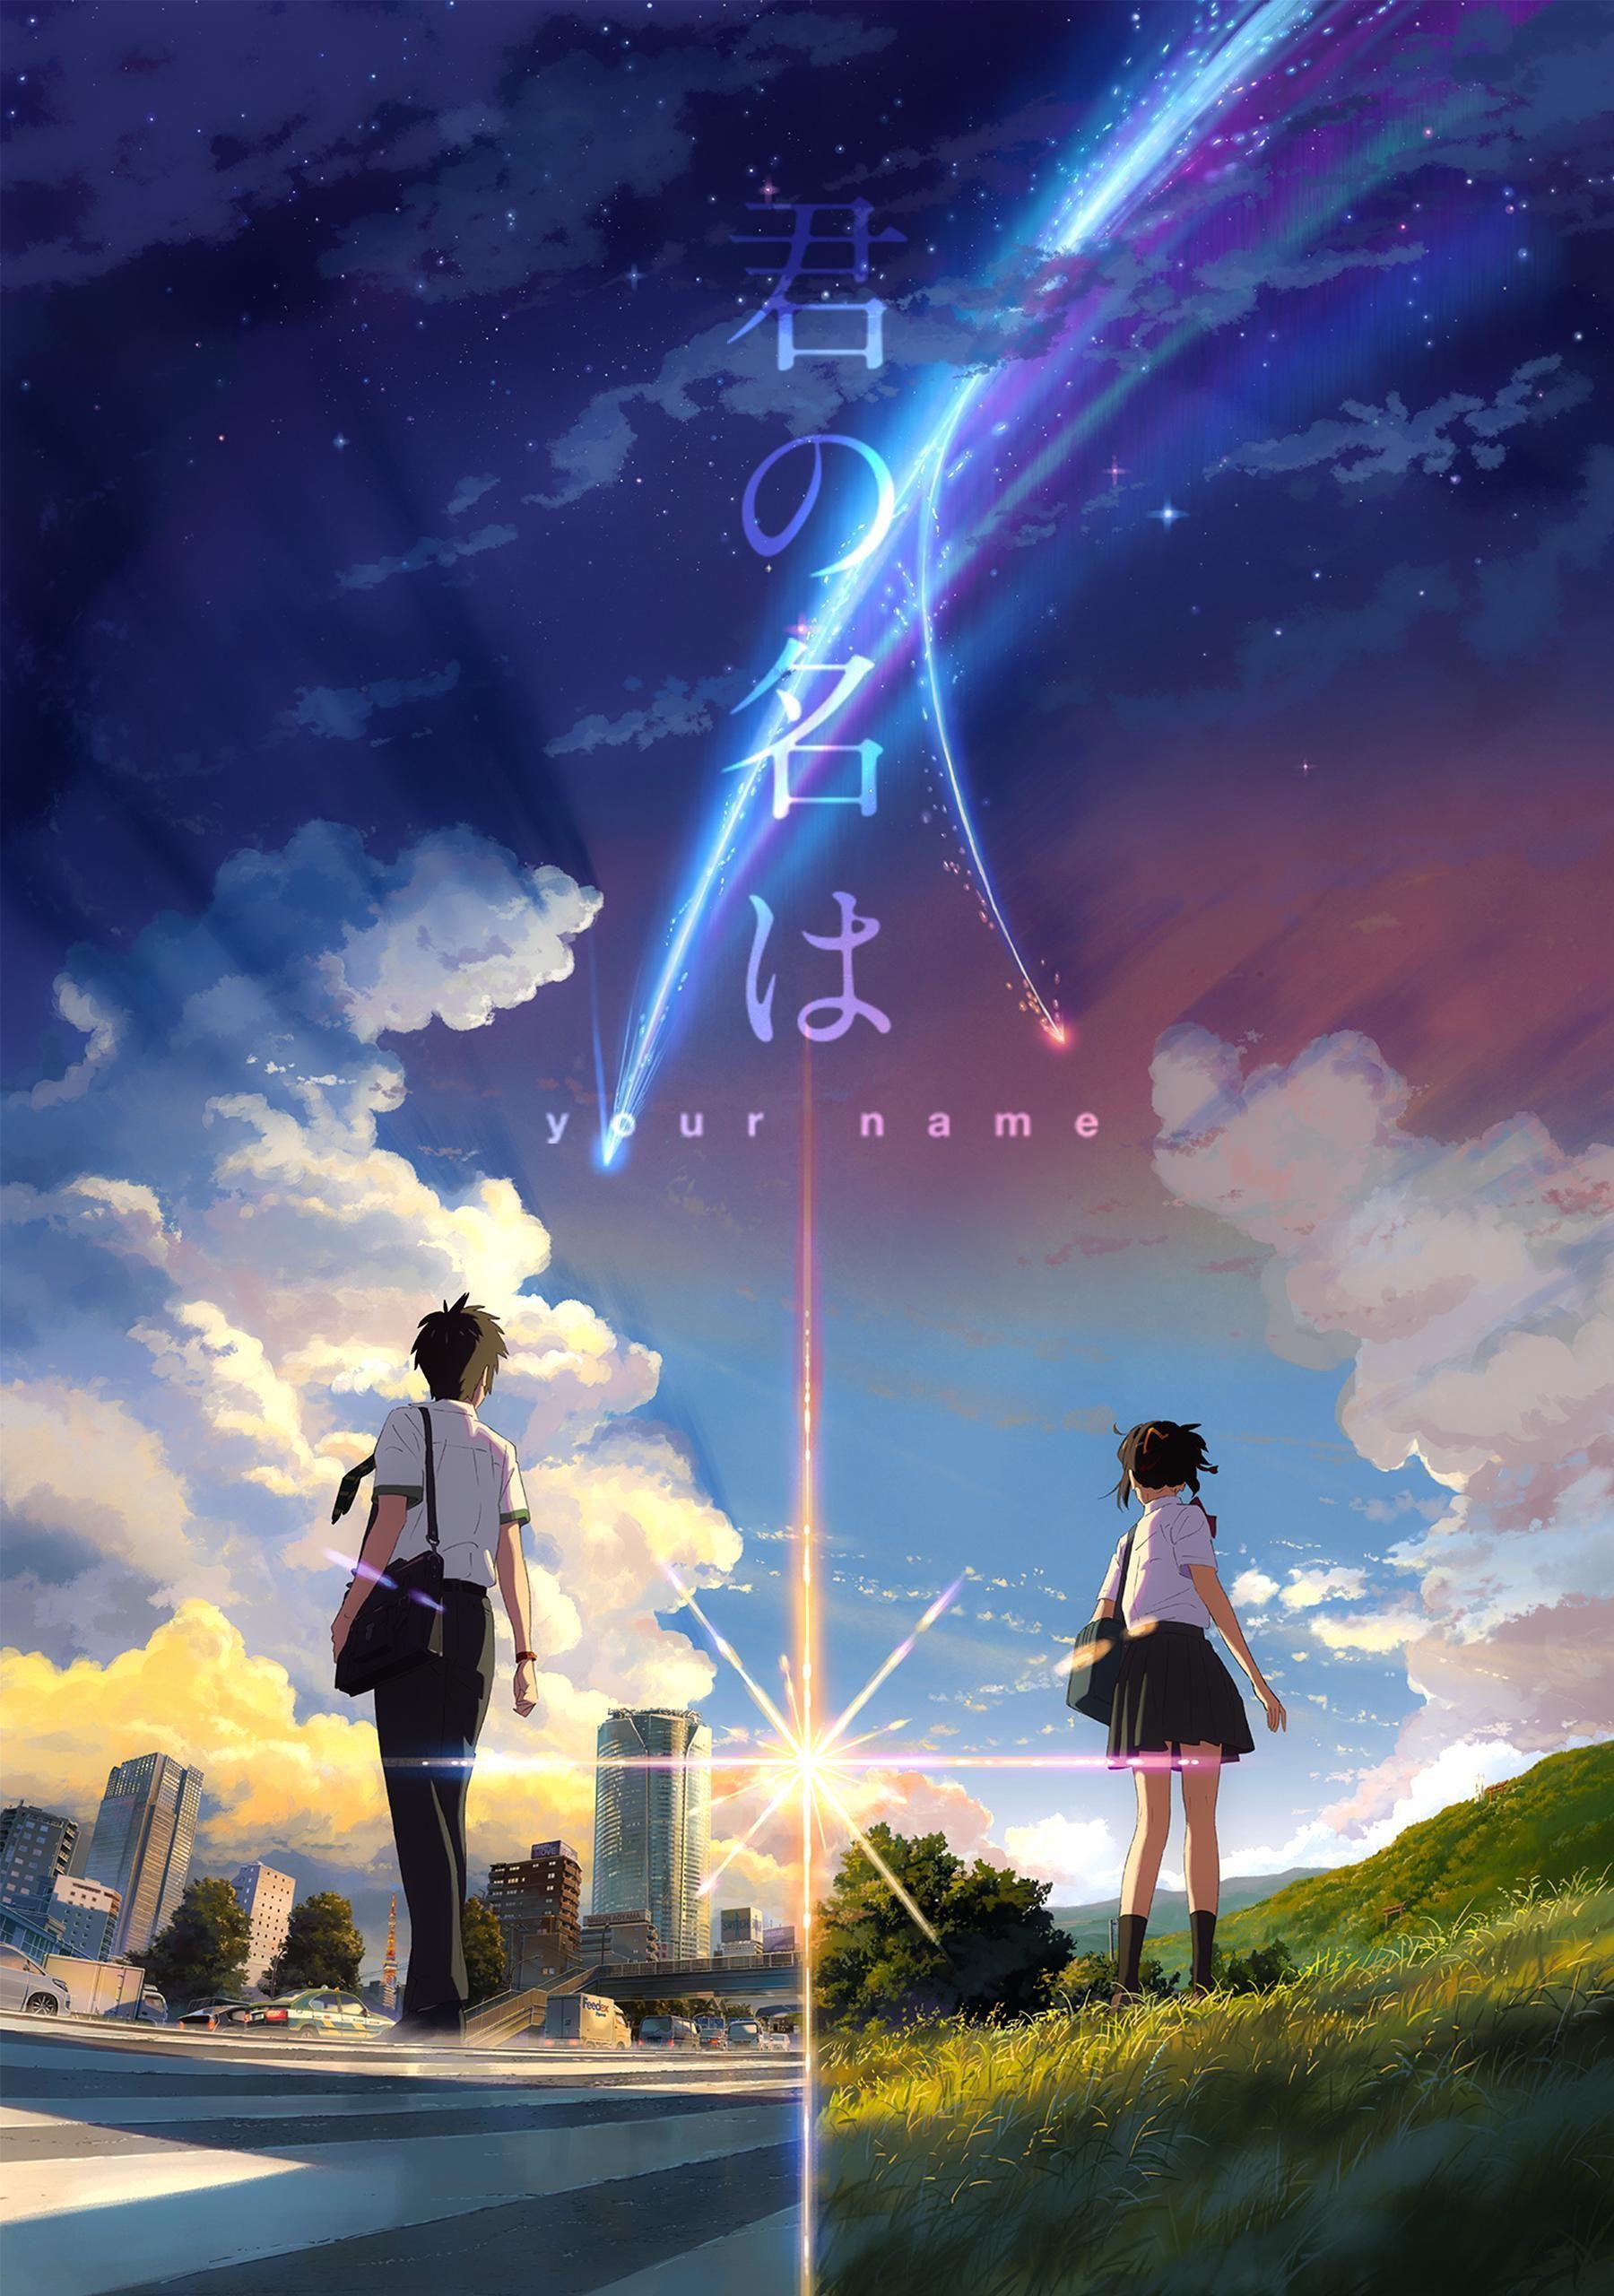 Your Name English Subbed On 7anime Net Your Name Anime Kimi No Na Wa Your Name Movie